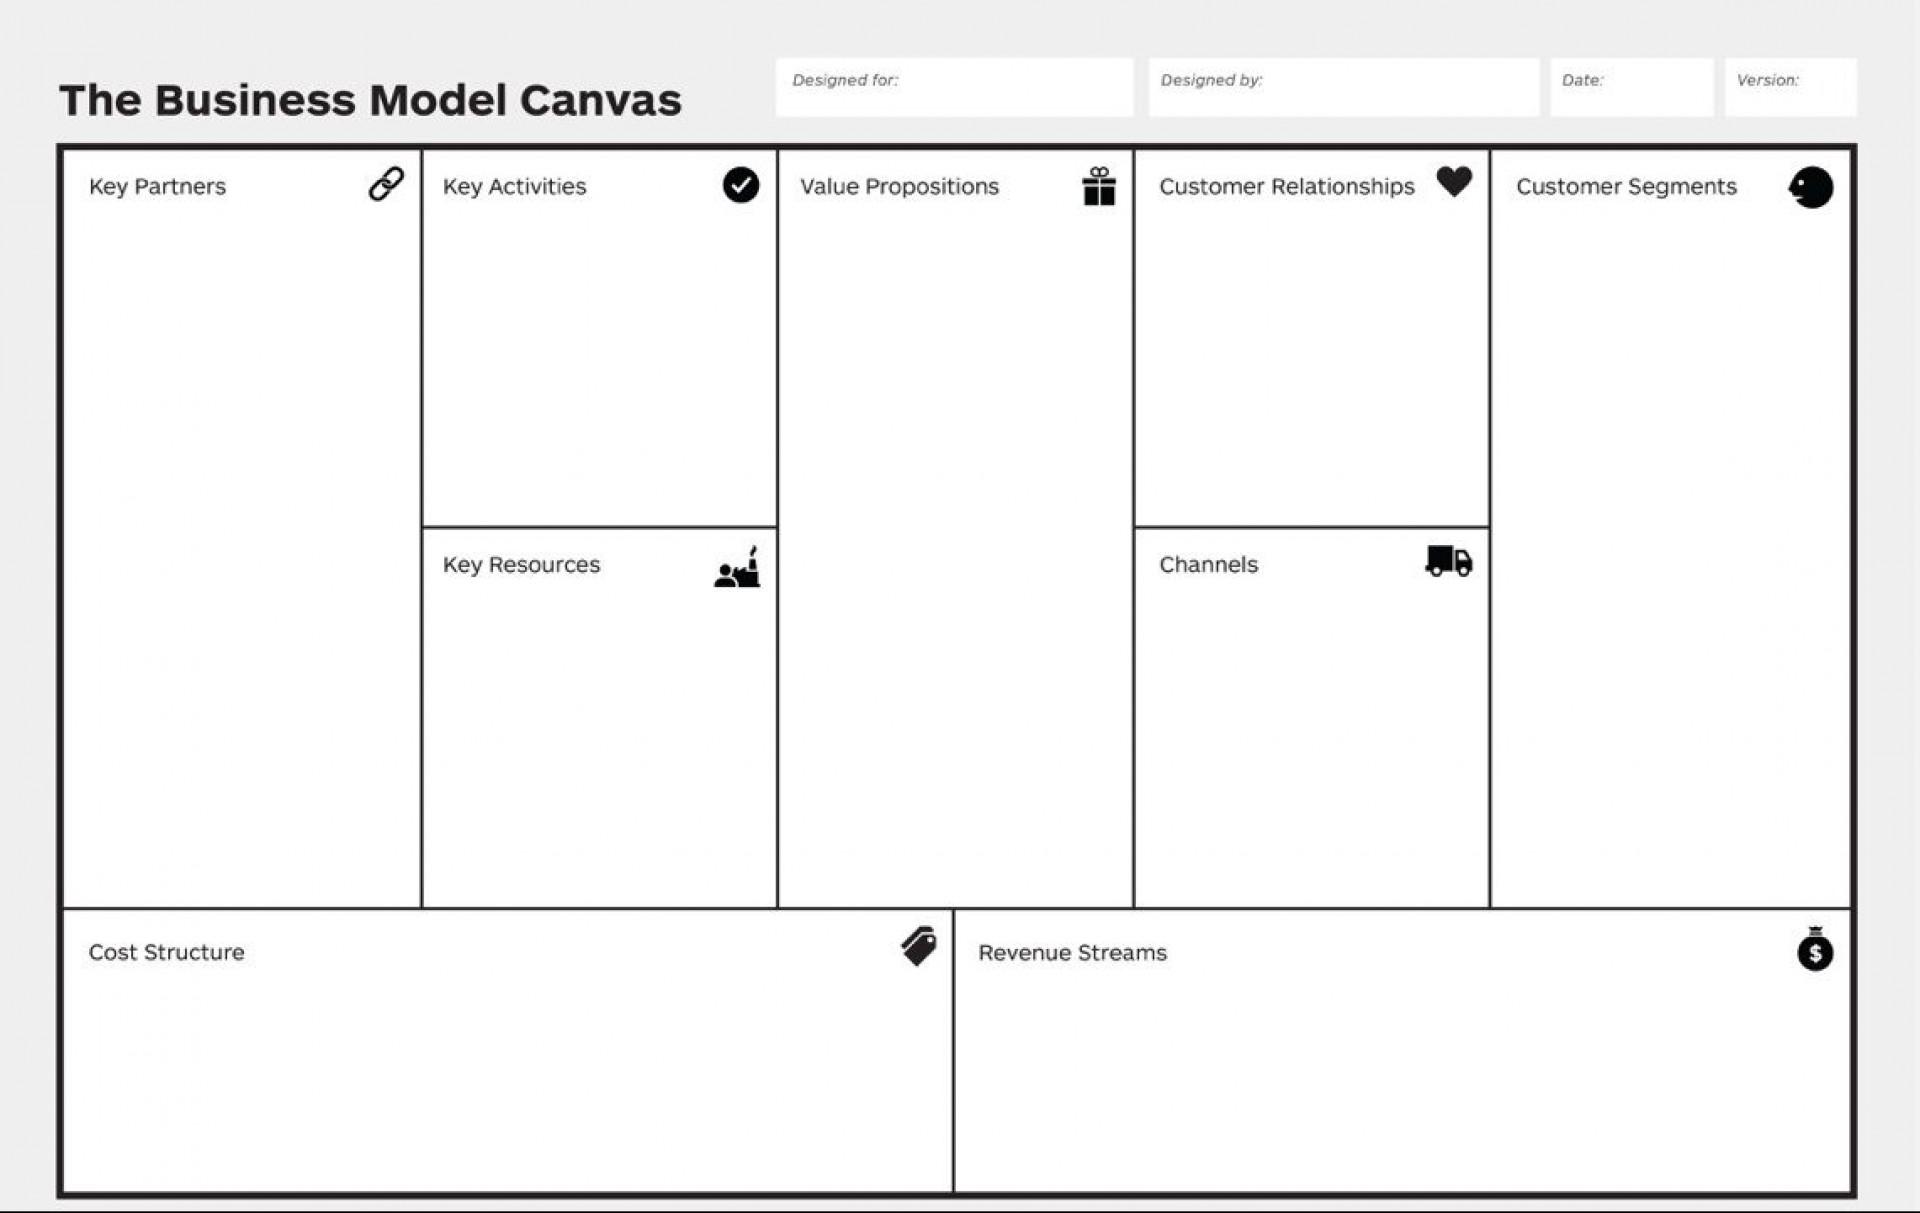 007 Surprising Busines Model Canva Template Word Sample  Microsoft Download1920